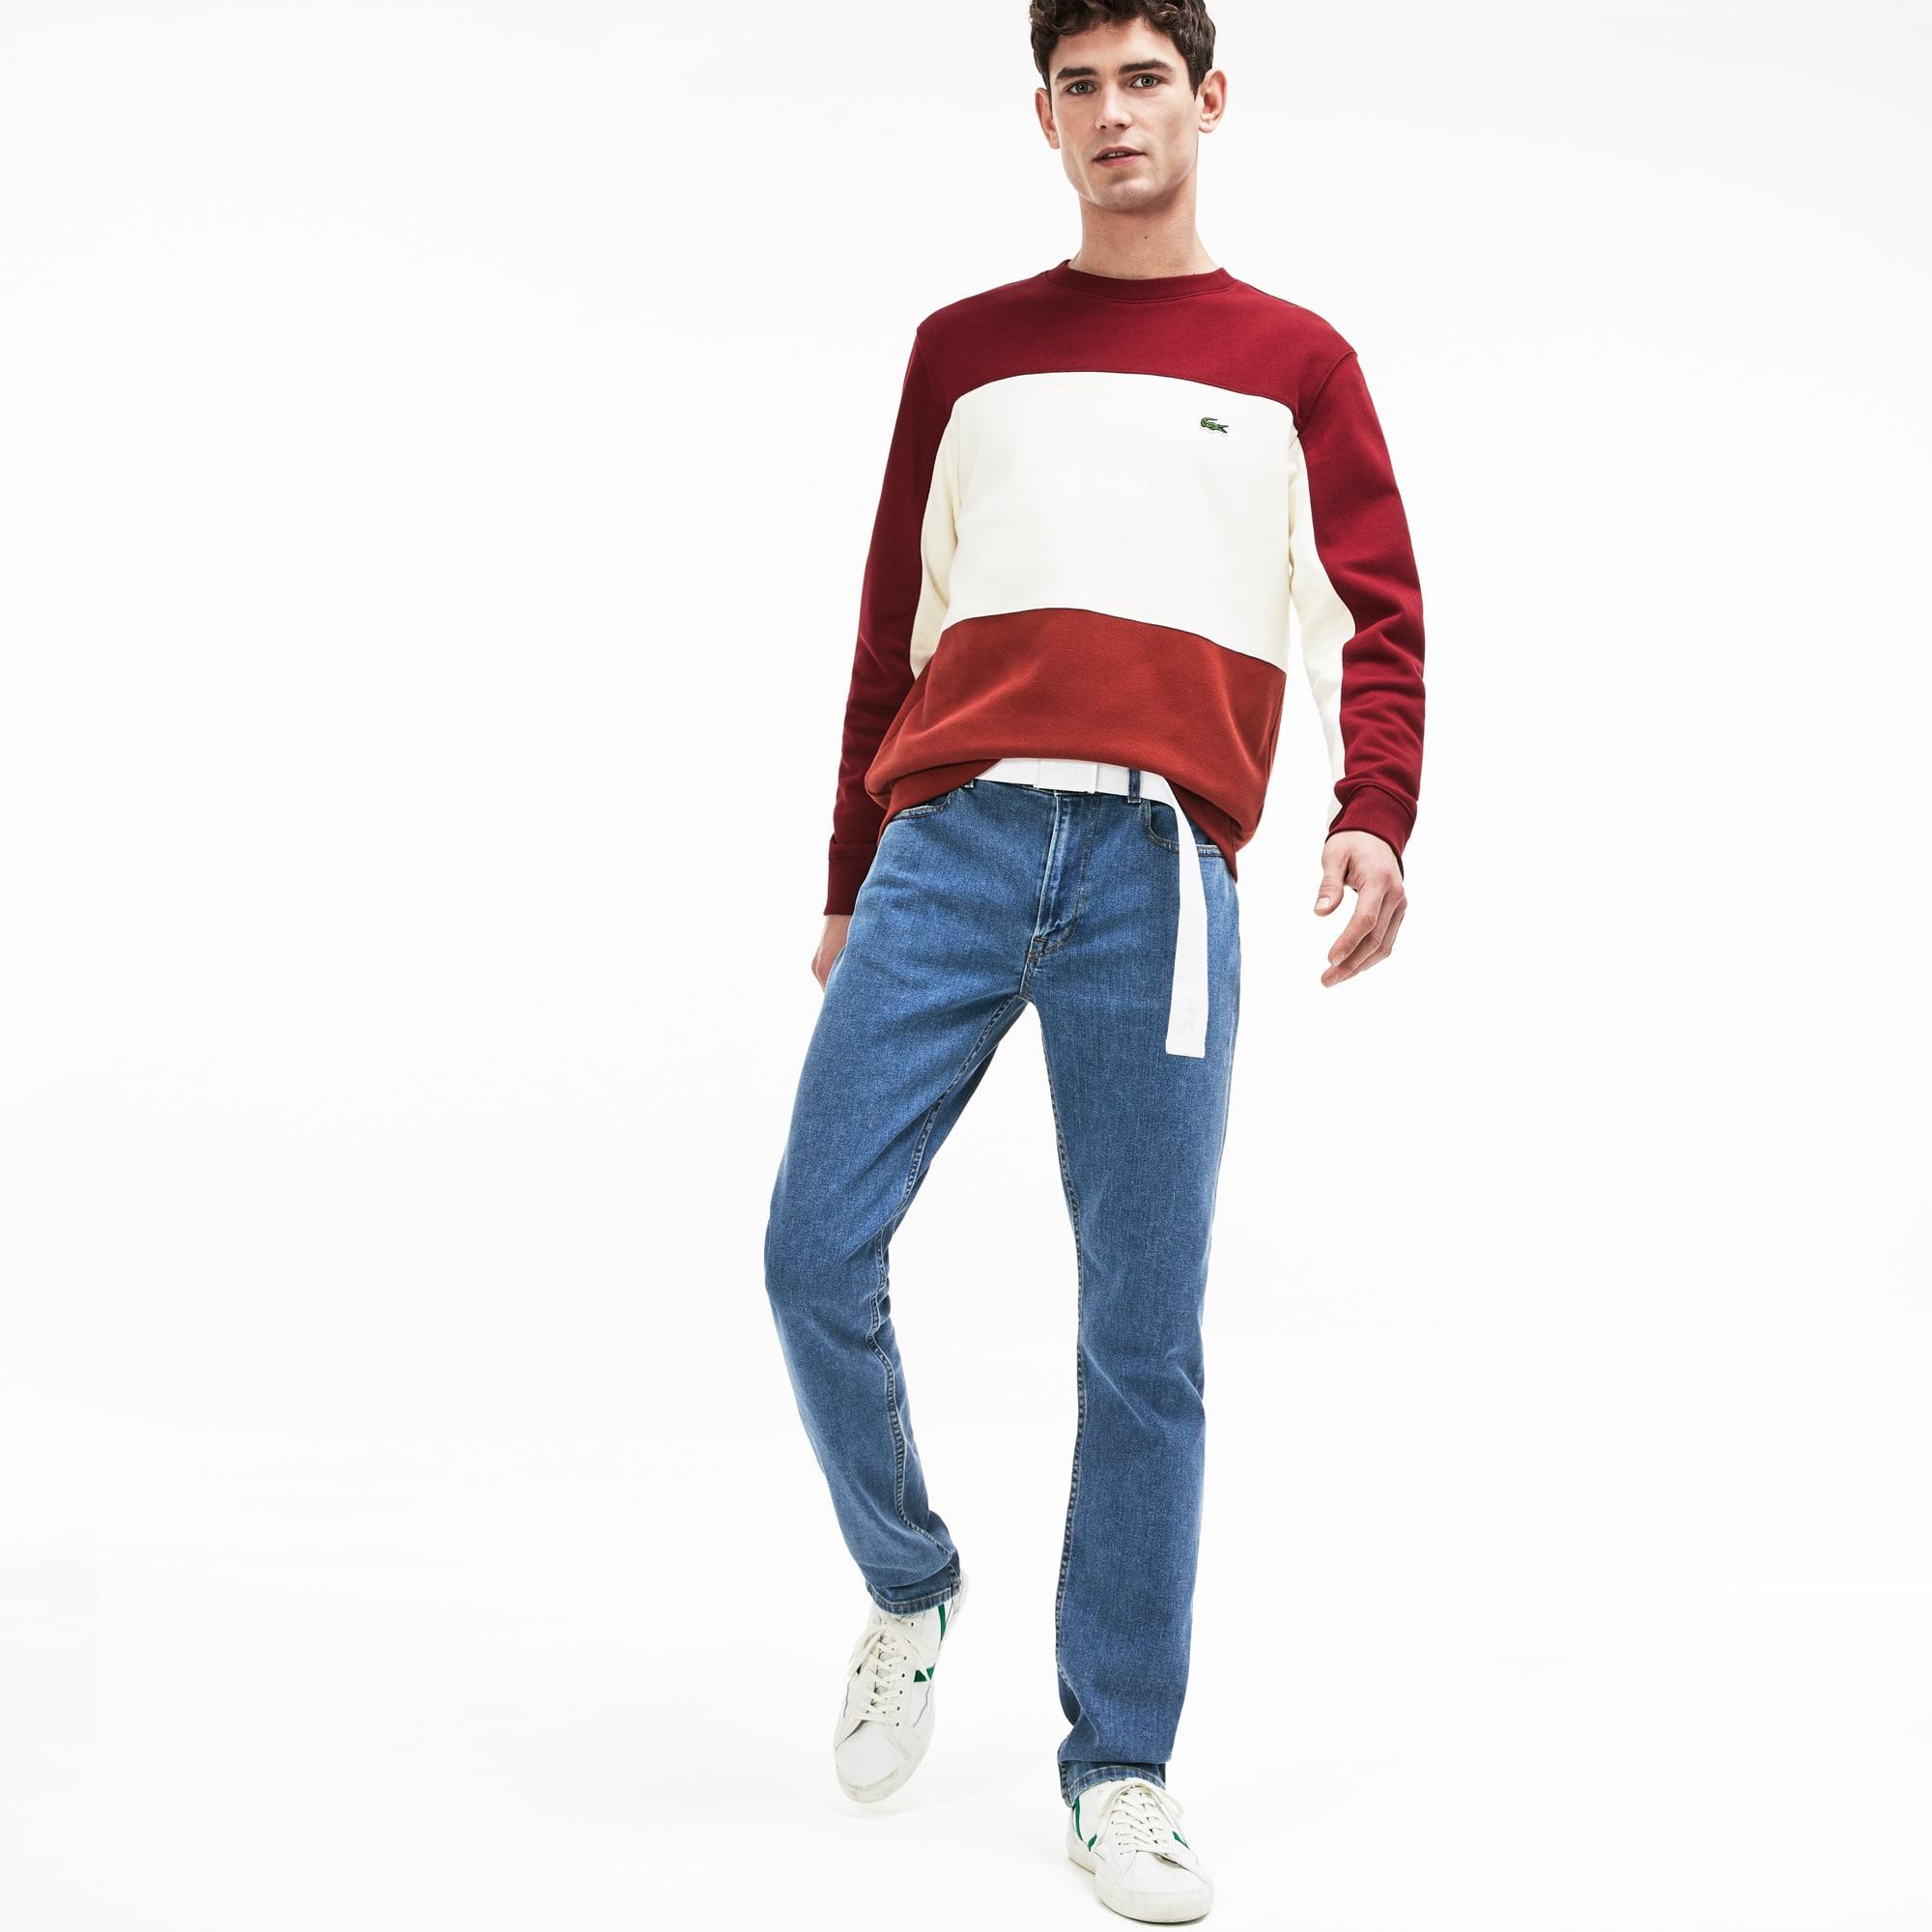 Lacoste Jeans Men's Slim Fit Stretch Denim 5-Pocket Jeans